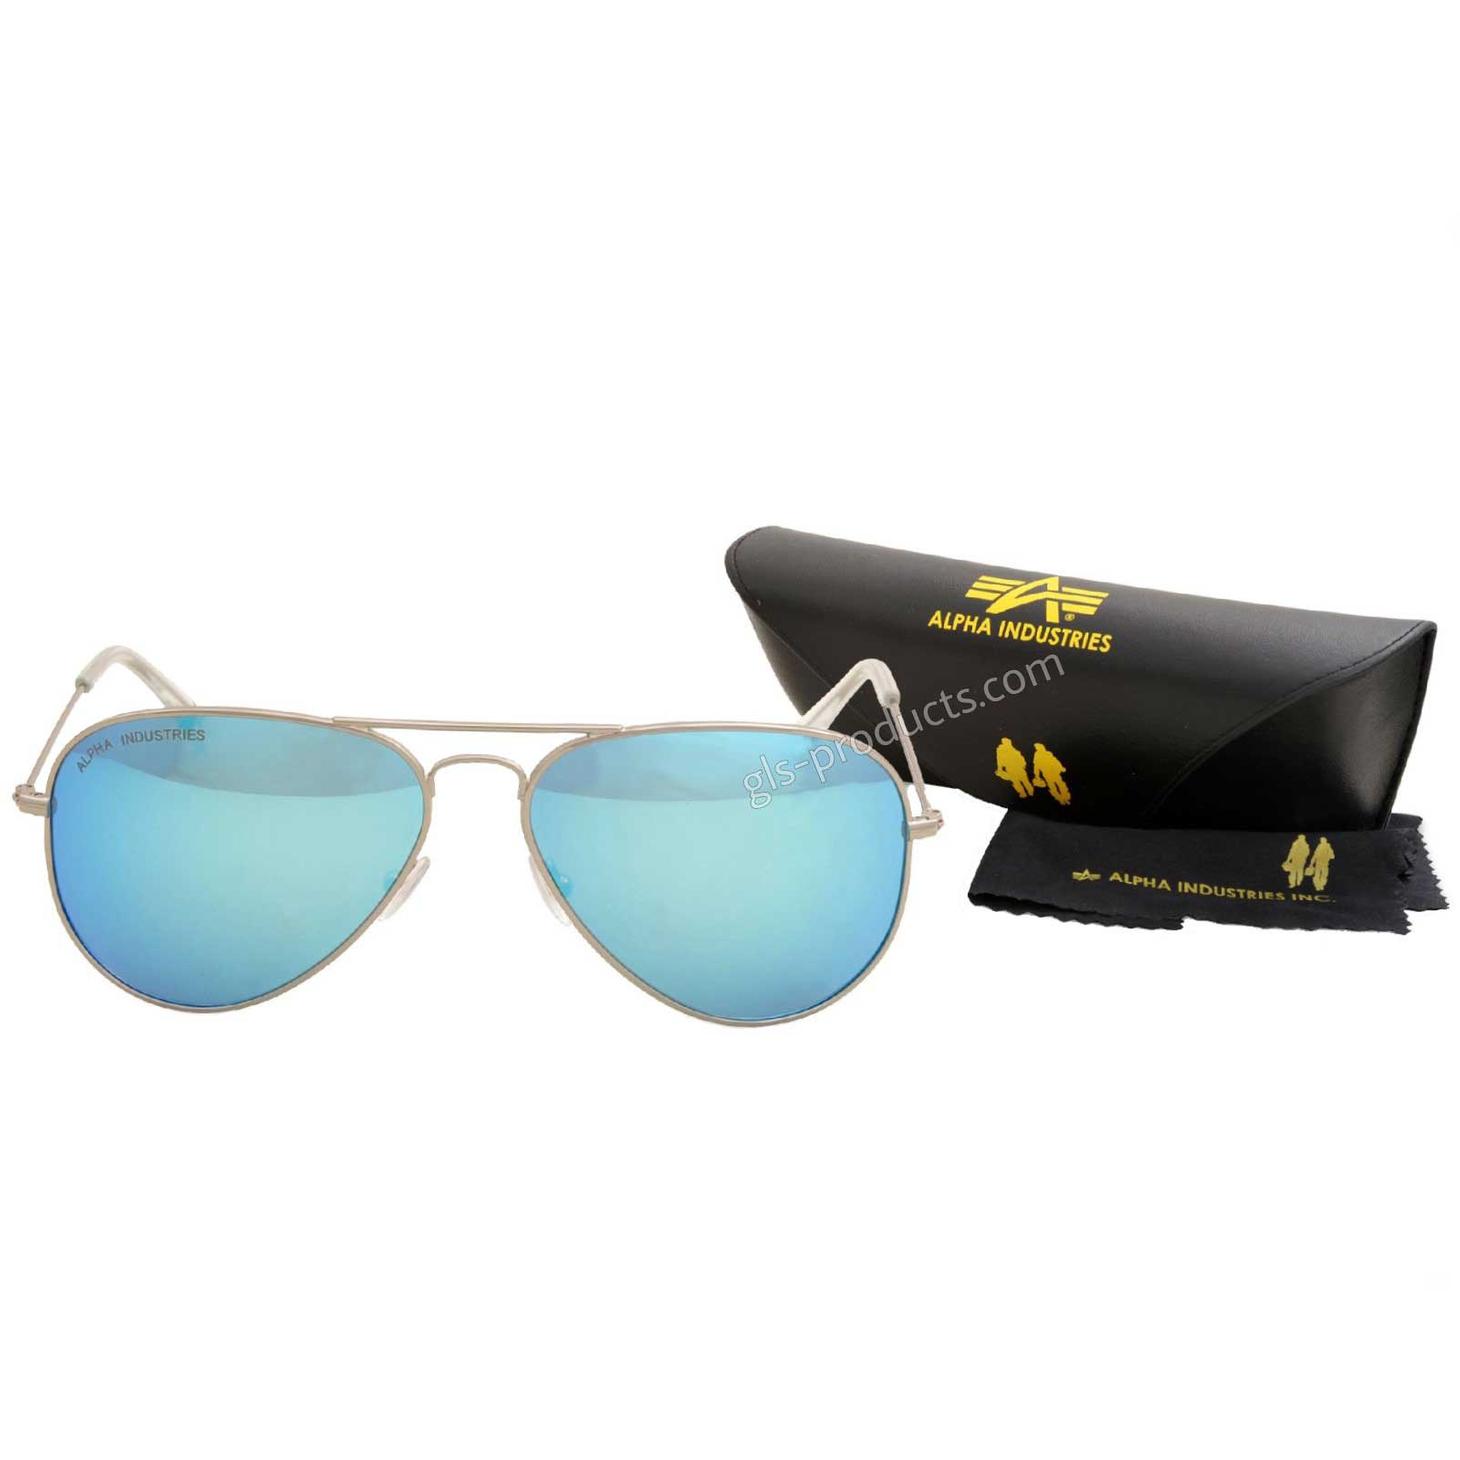 Alpha Top Gun Sunglasses mirrored 158904 – Picture 4